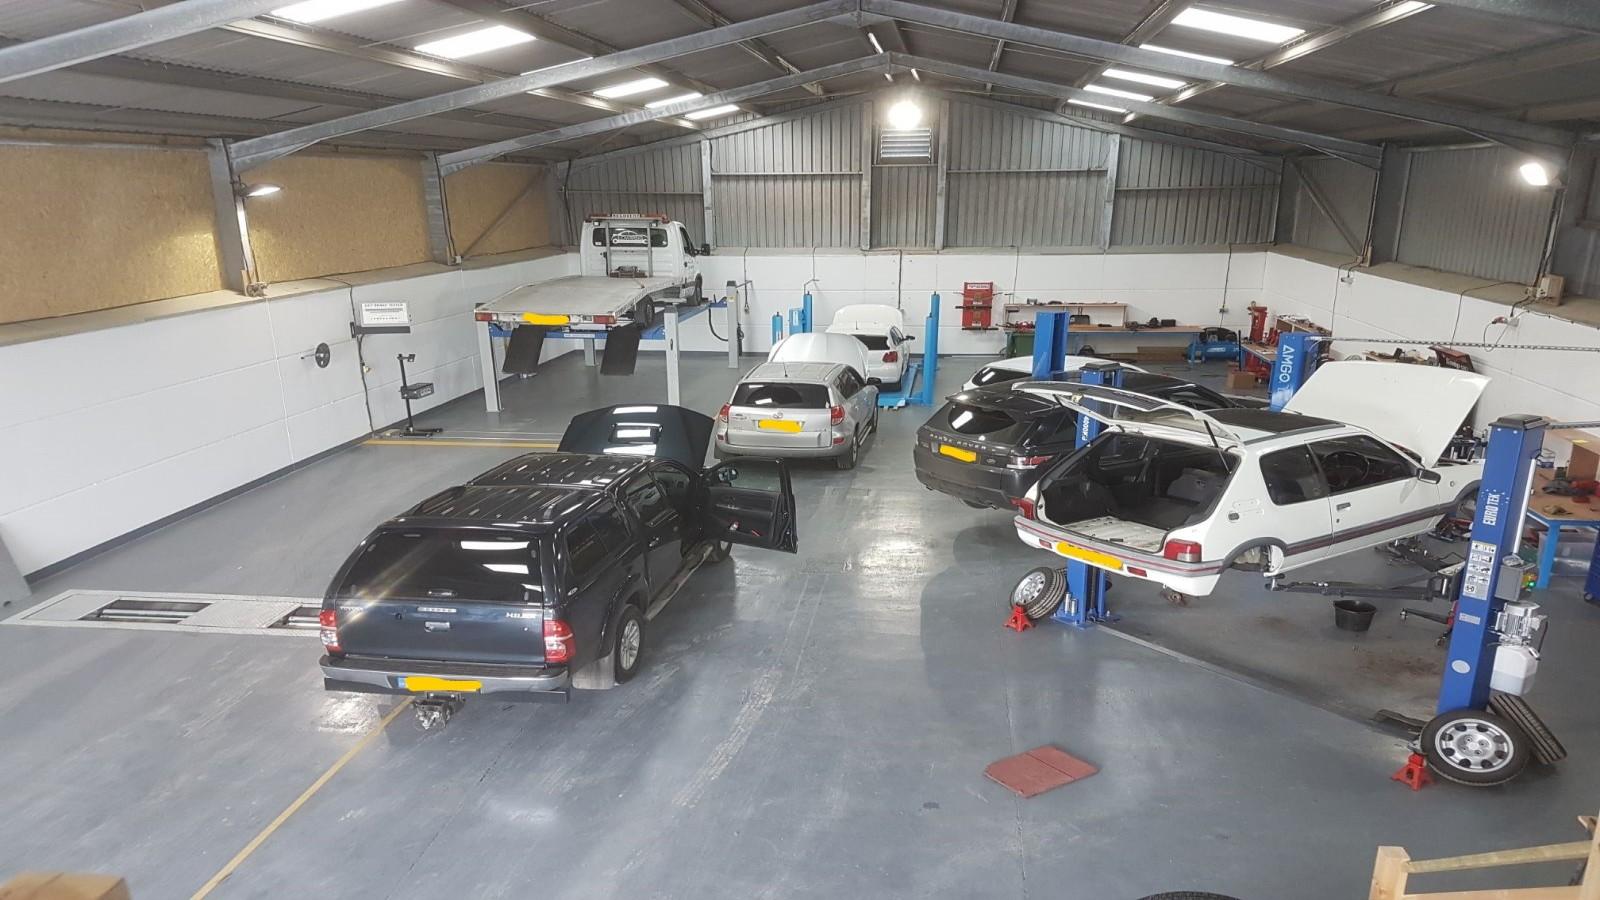 Edwards Vehicle Services Ltd